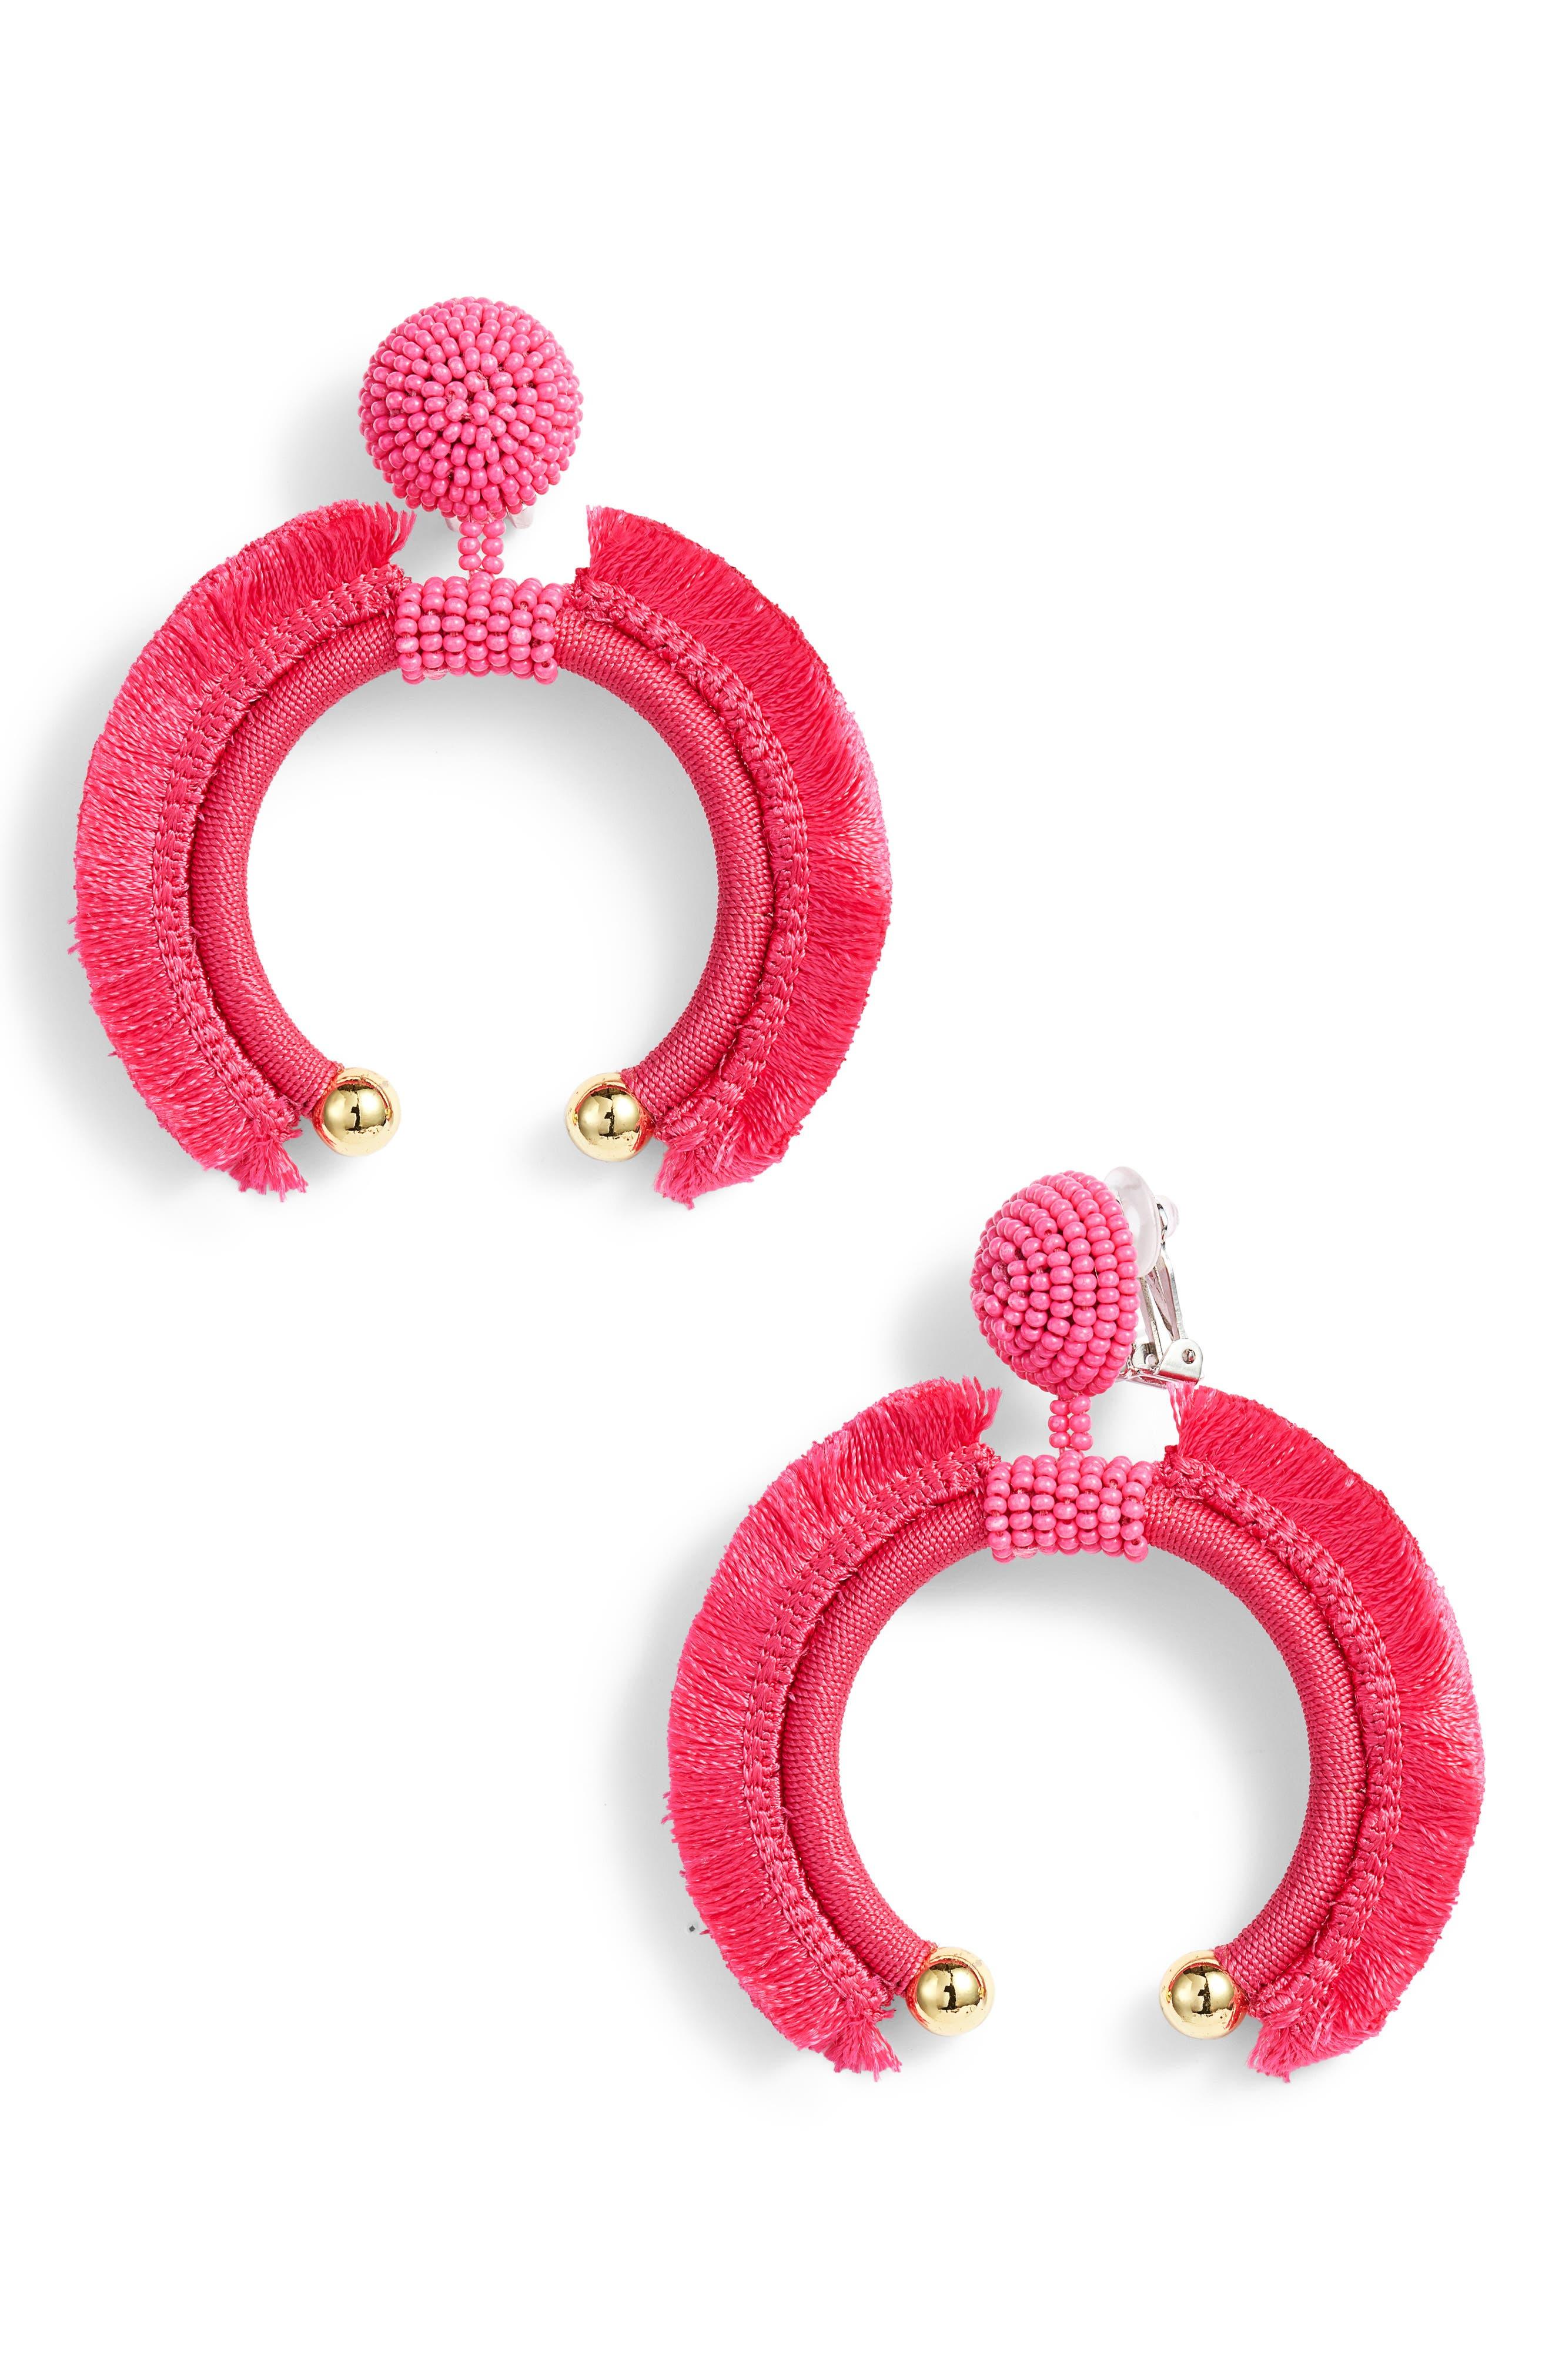 Eclipse Fringe Drop Earrings,                             Main thumbnail 1, color,                             Fuchsia